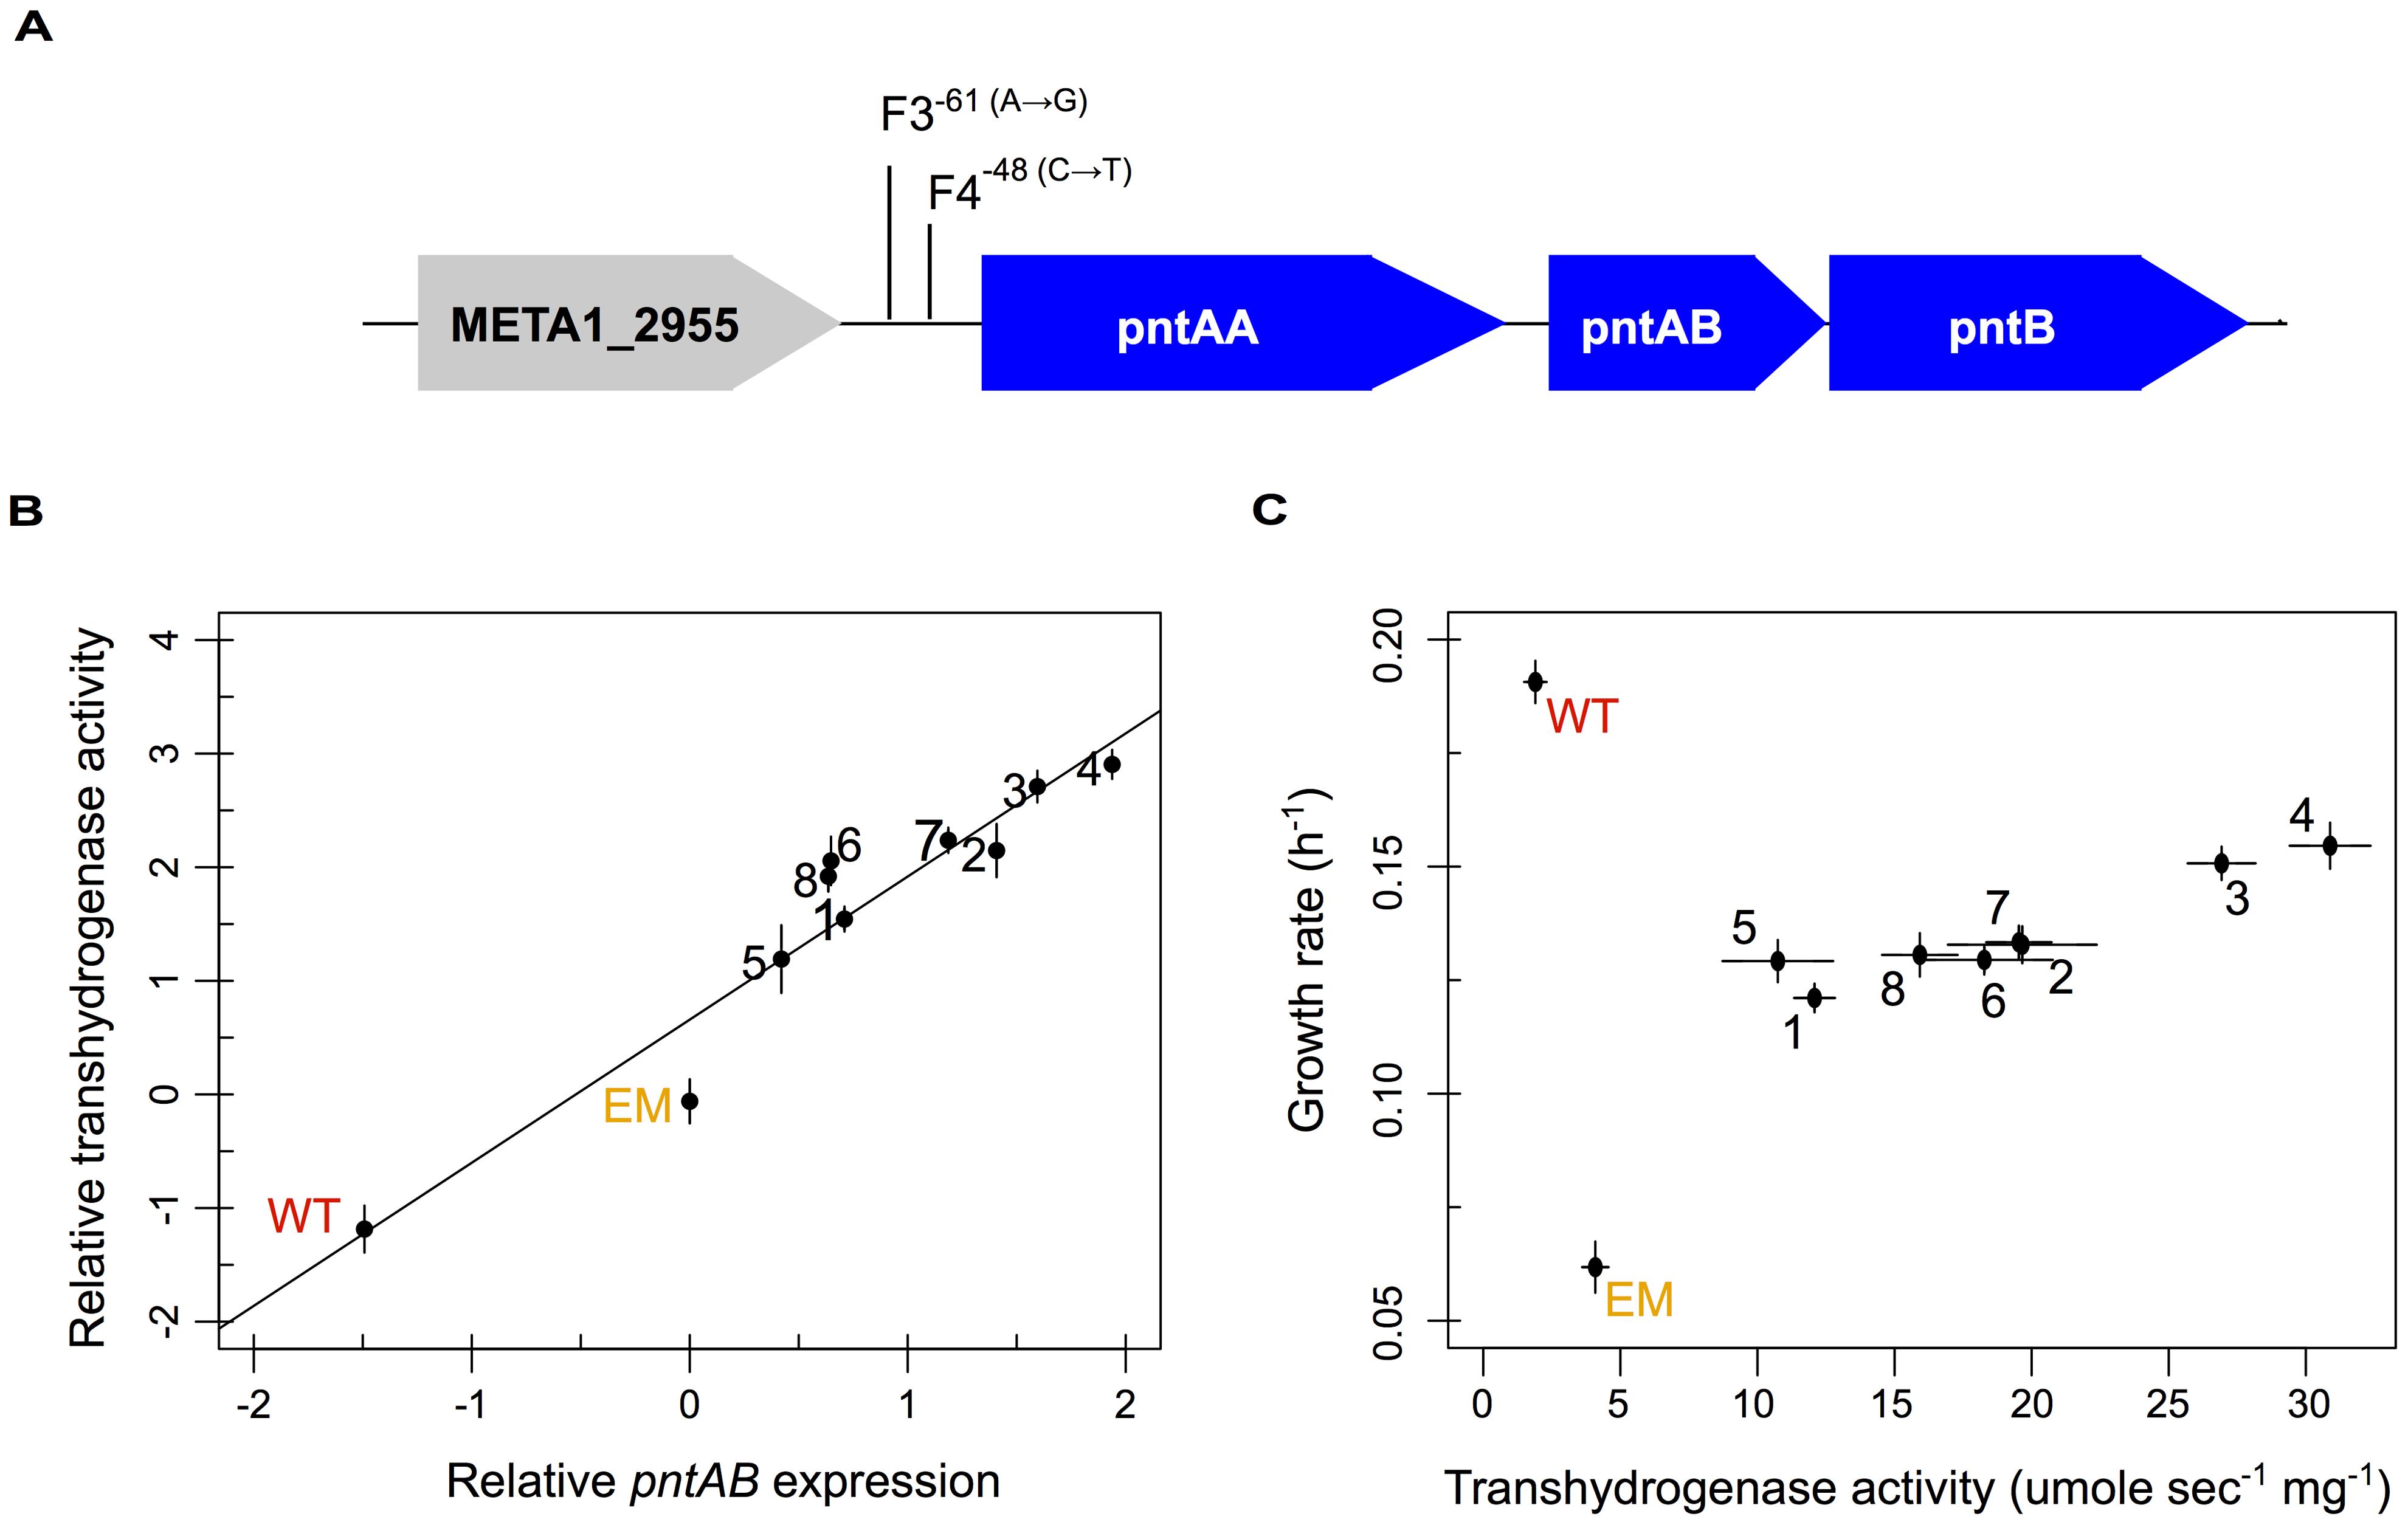 Multiple evolved mechanisms reinforce increased <i>pntAB</i> expression and transhydrogenase activity.